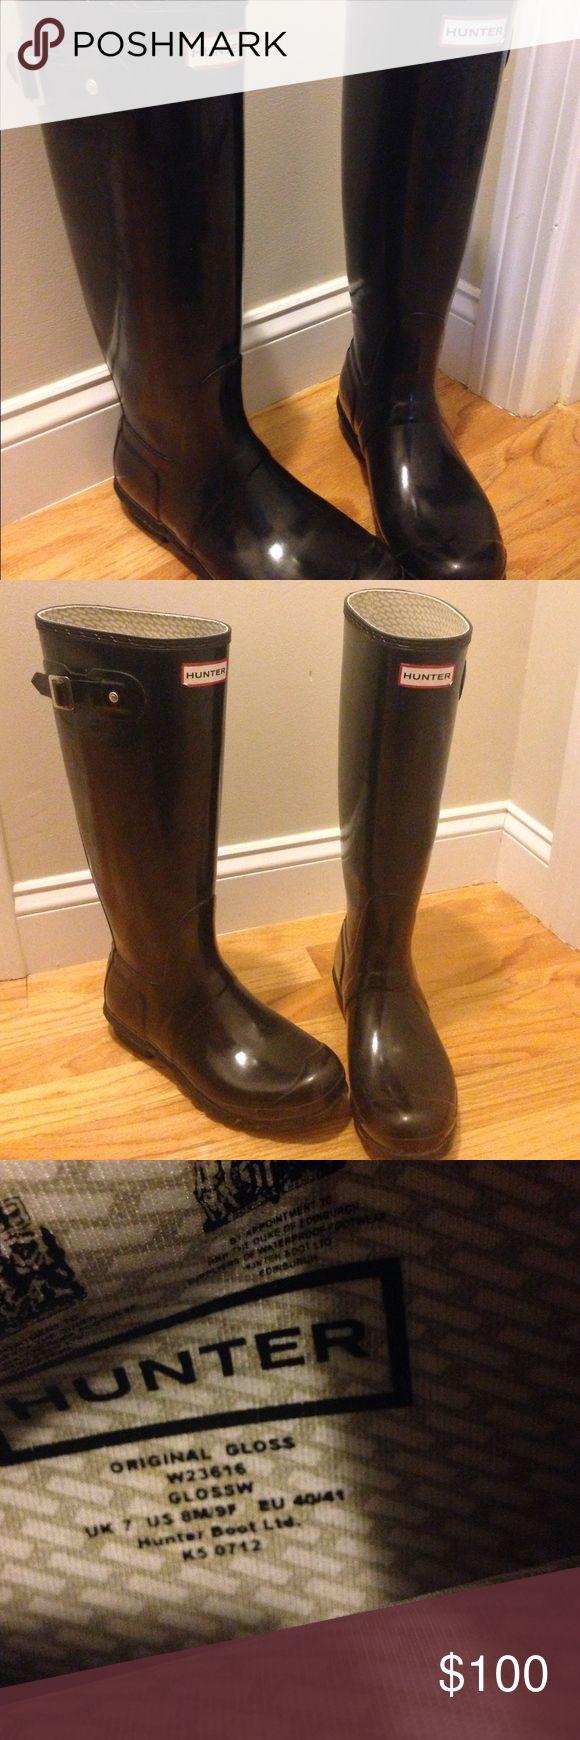 Women's Hunter Boots Women's Hunter Boots. Black original gloss. Size 8m/9f Hunter Boots Shoes Winter & Rain Boots